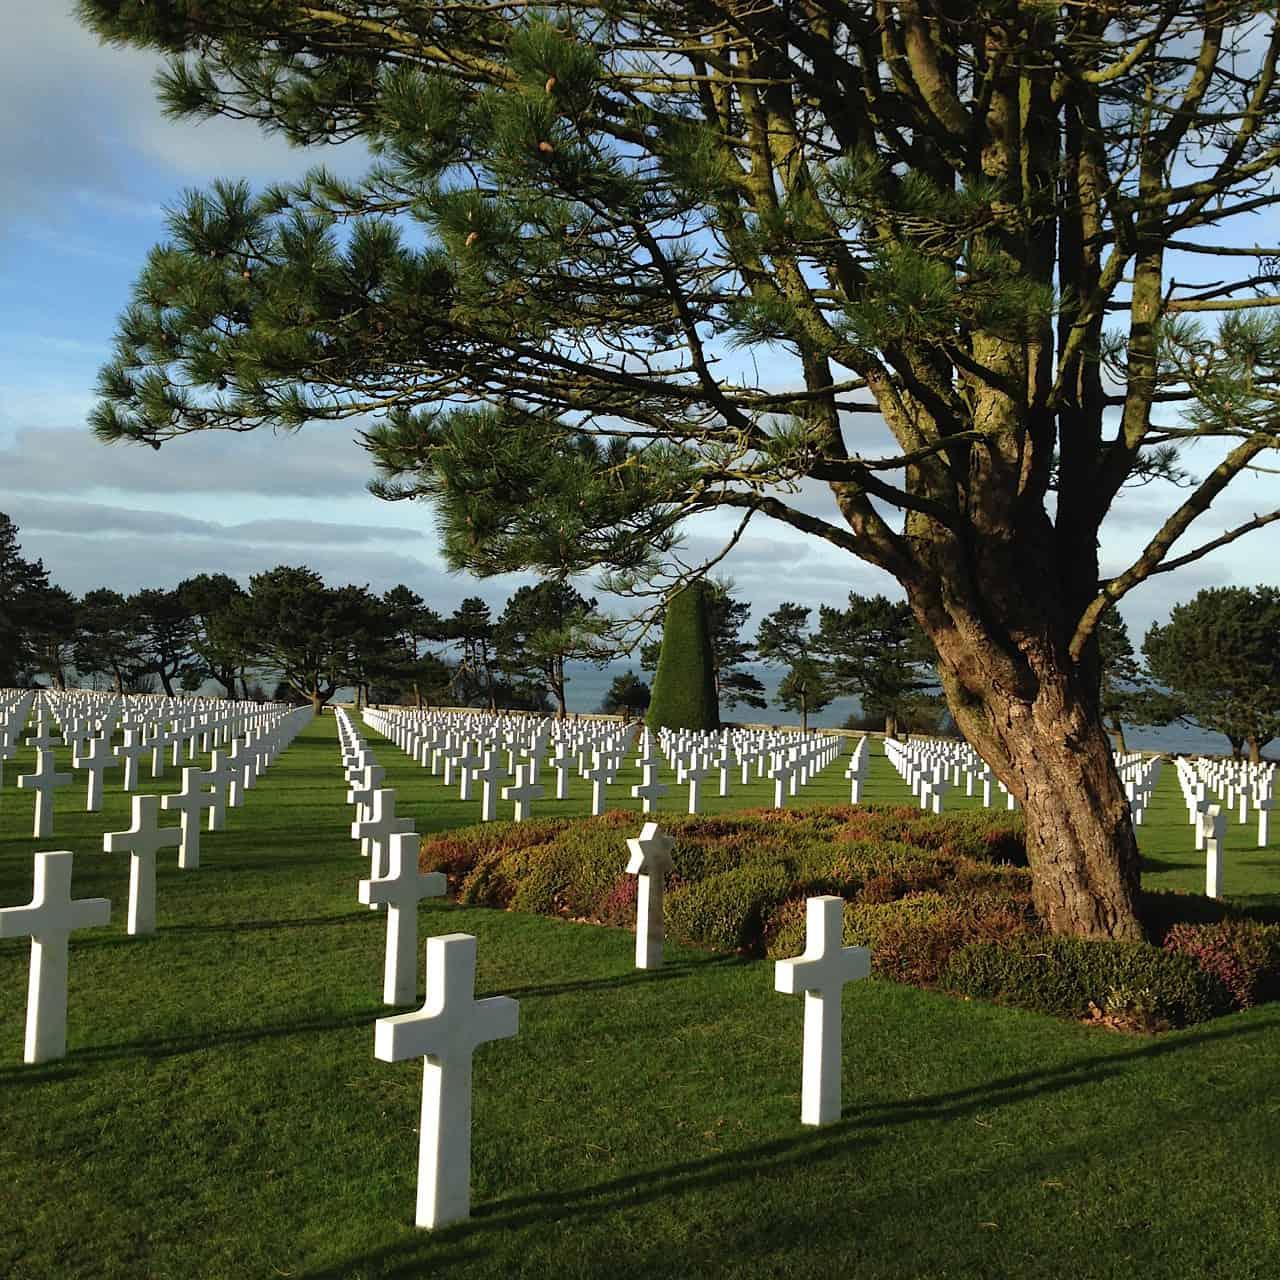 Gravesites at Normandy